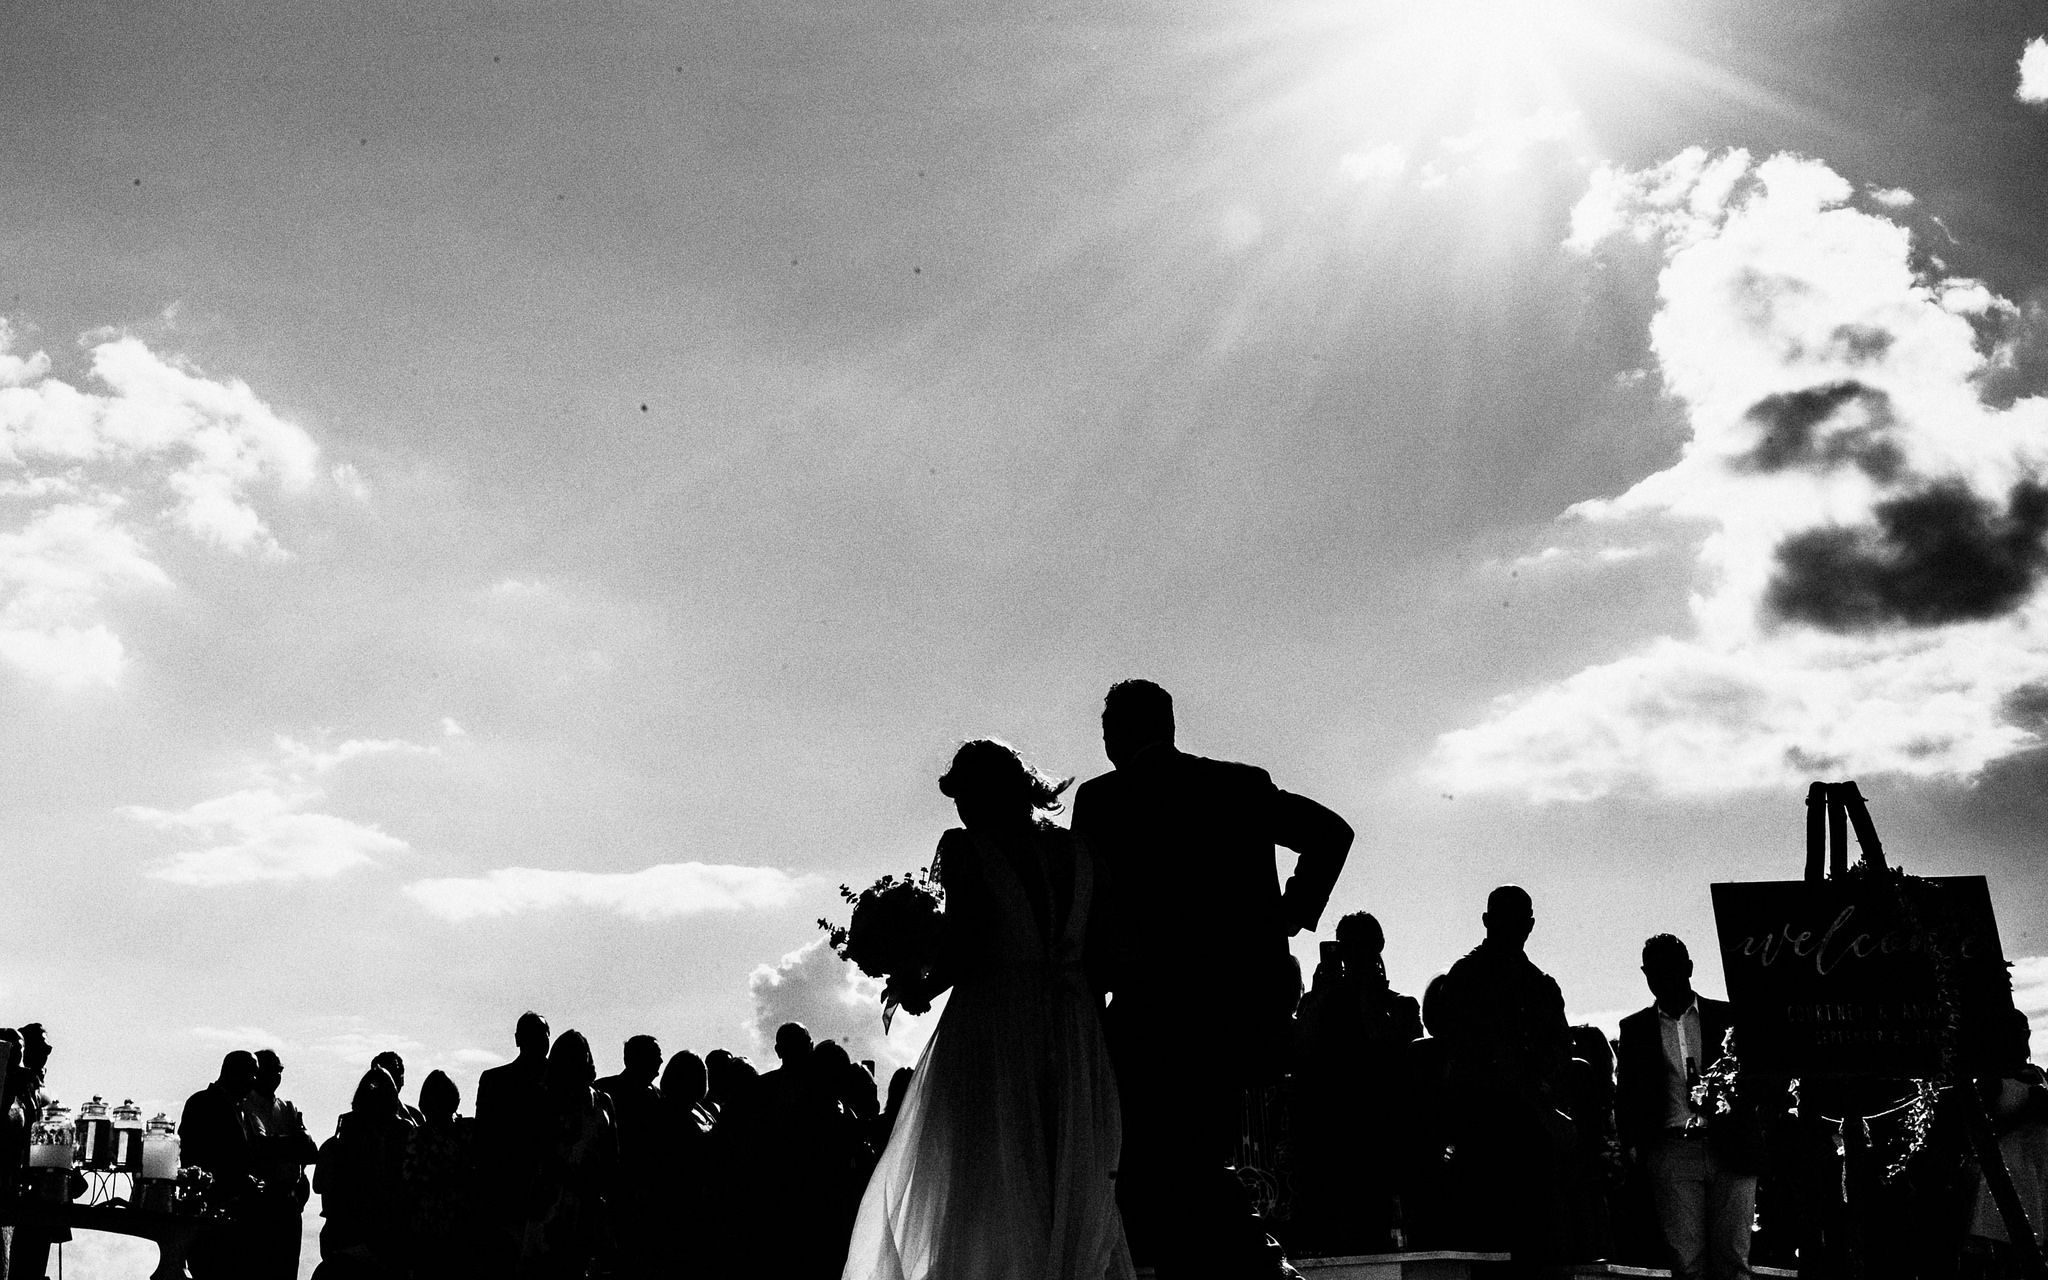 Leica M10 + Nokton 35mm @ f/16